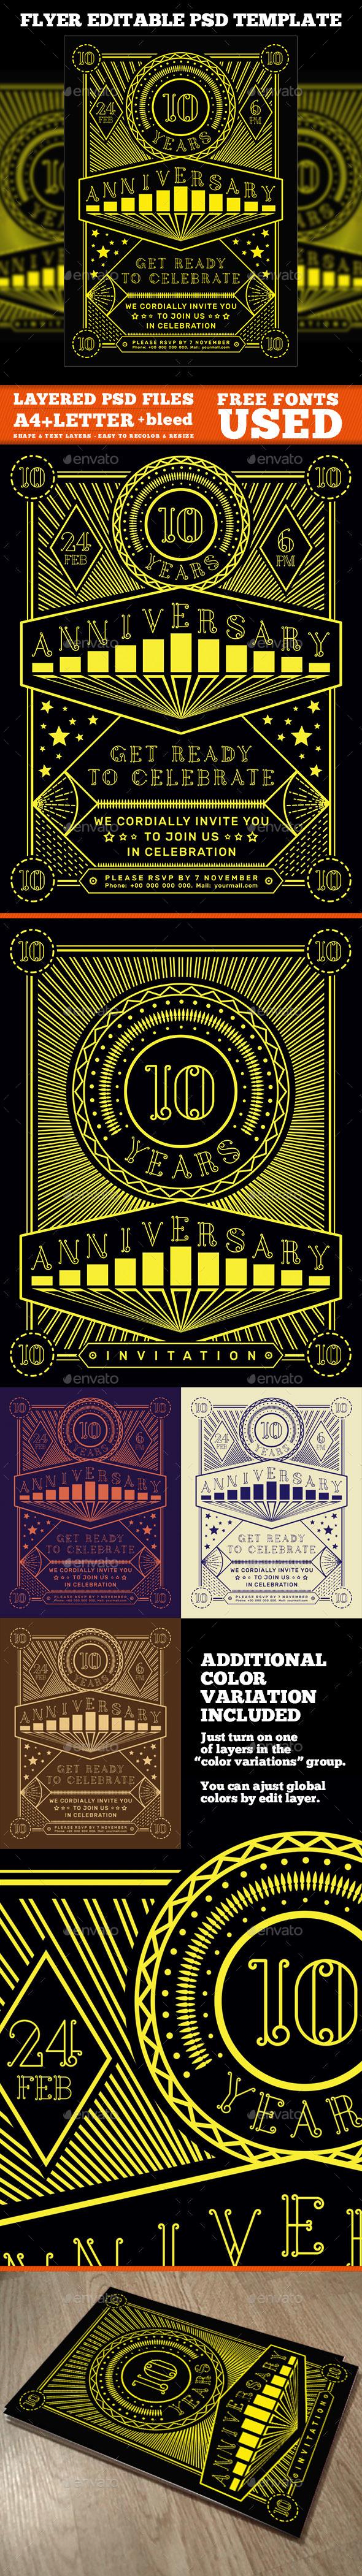 Editable Anniversary Flyer - Events Flyers